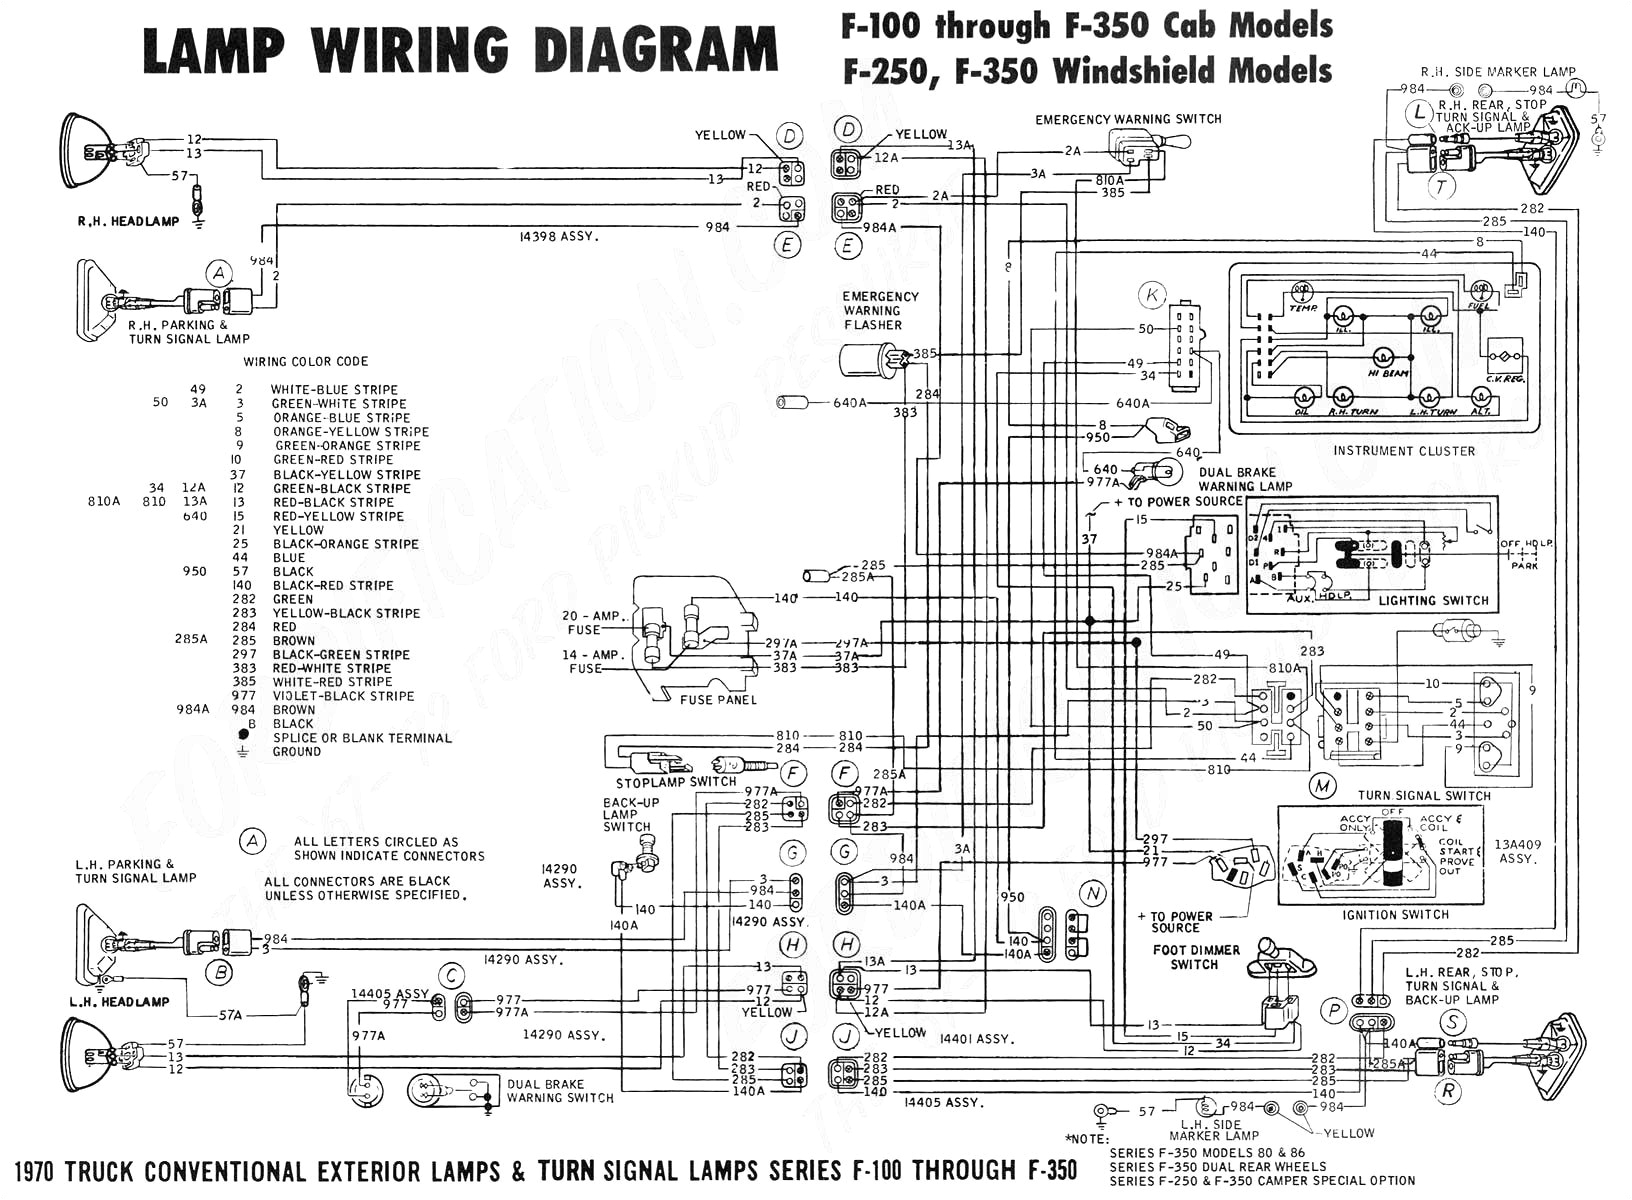 ford 7 pin trailer wiring diagram 2003 ford f350 alternator wiring wire center u2022 rh 140 82 51 249 ford radio wiring harness ford truck trailer wiring 4m jpg